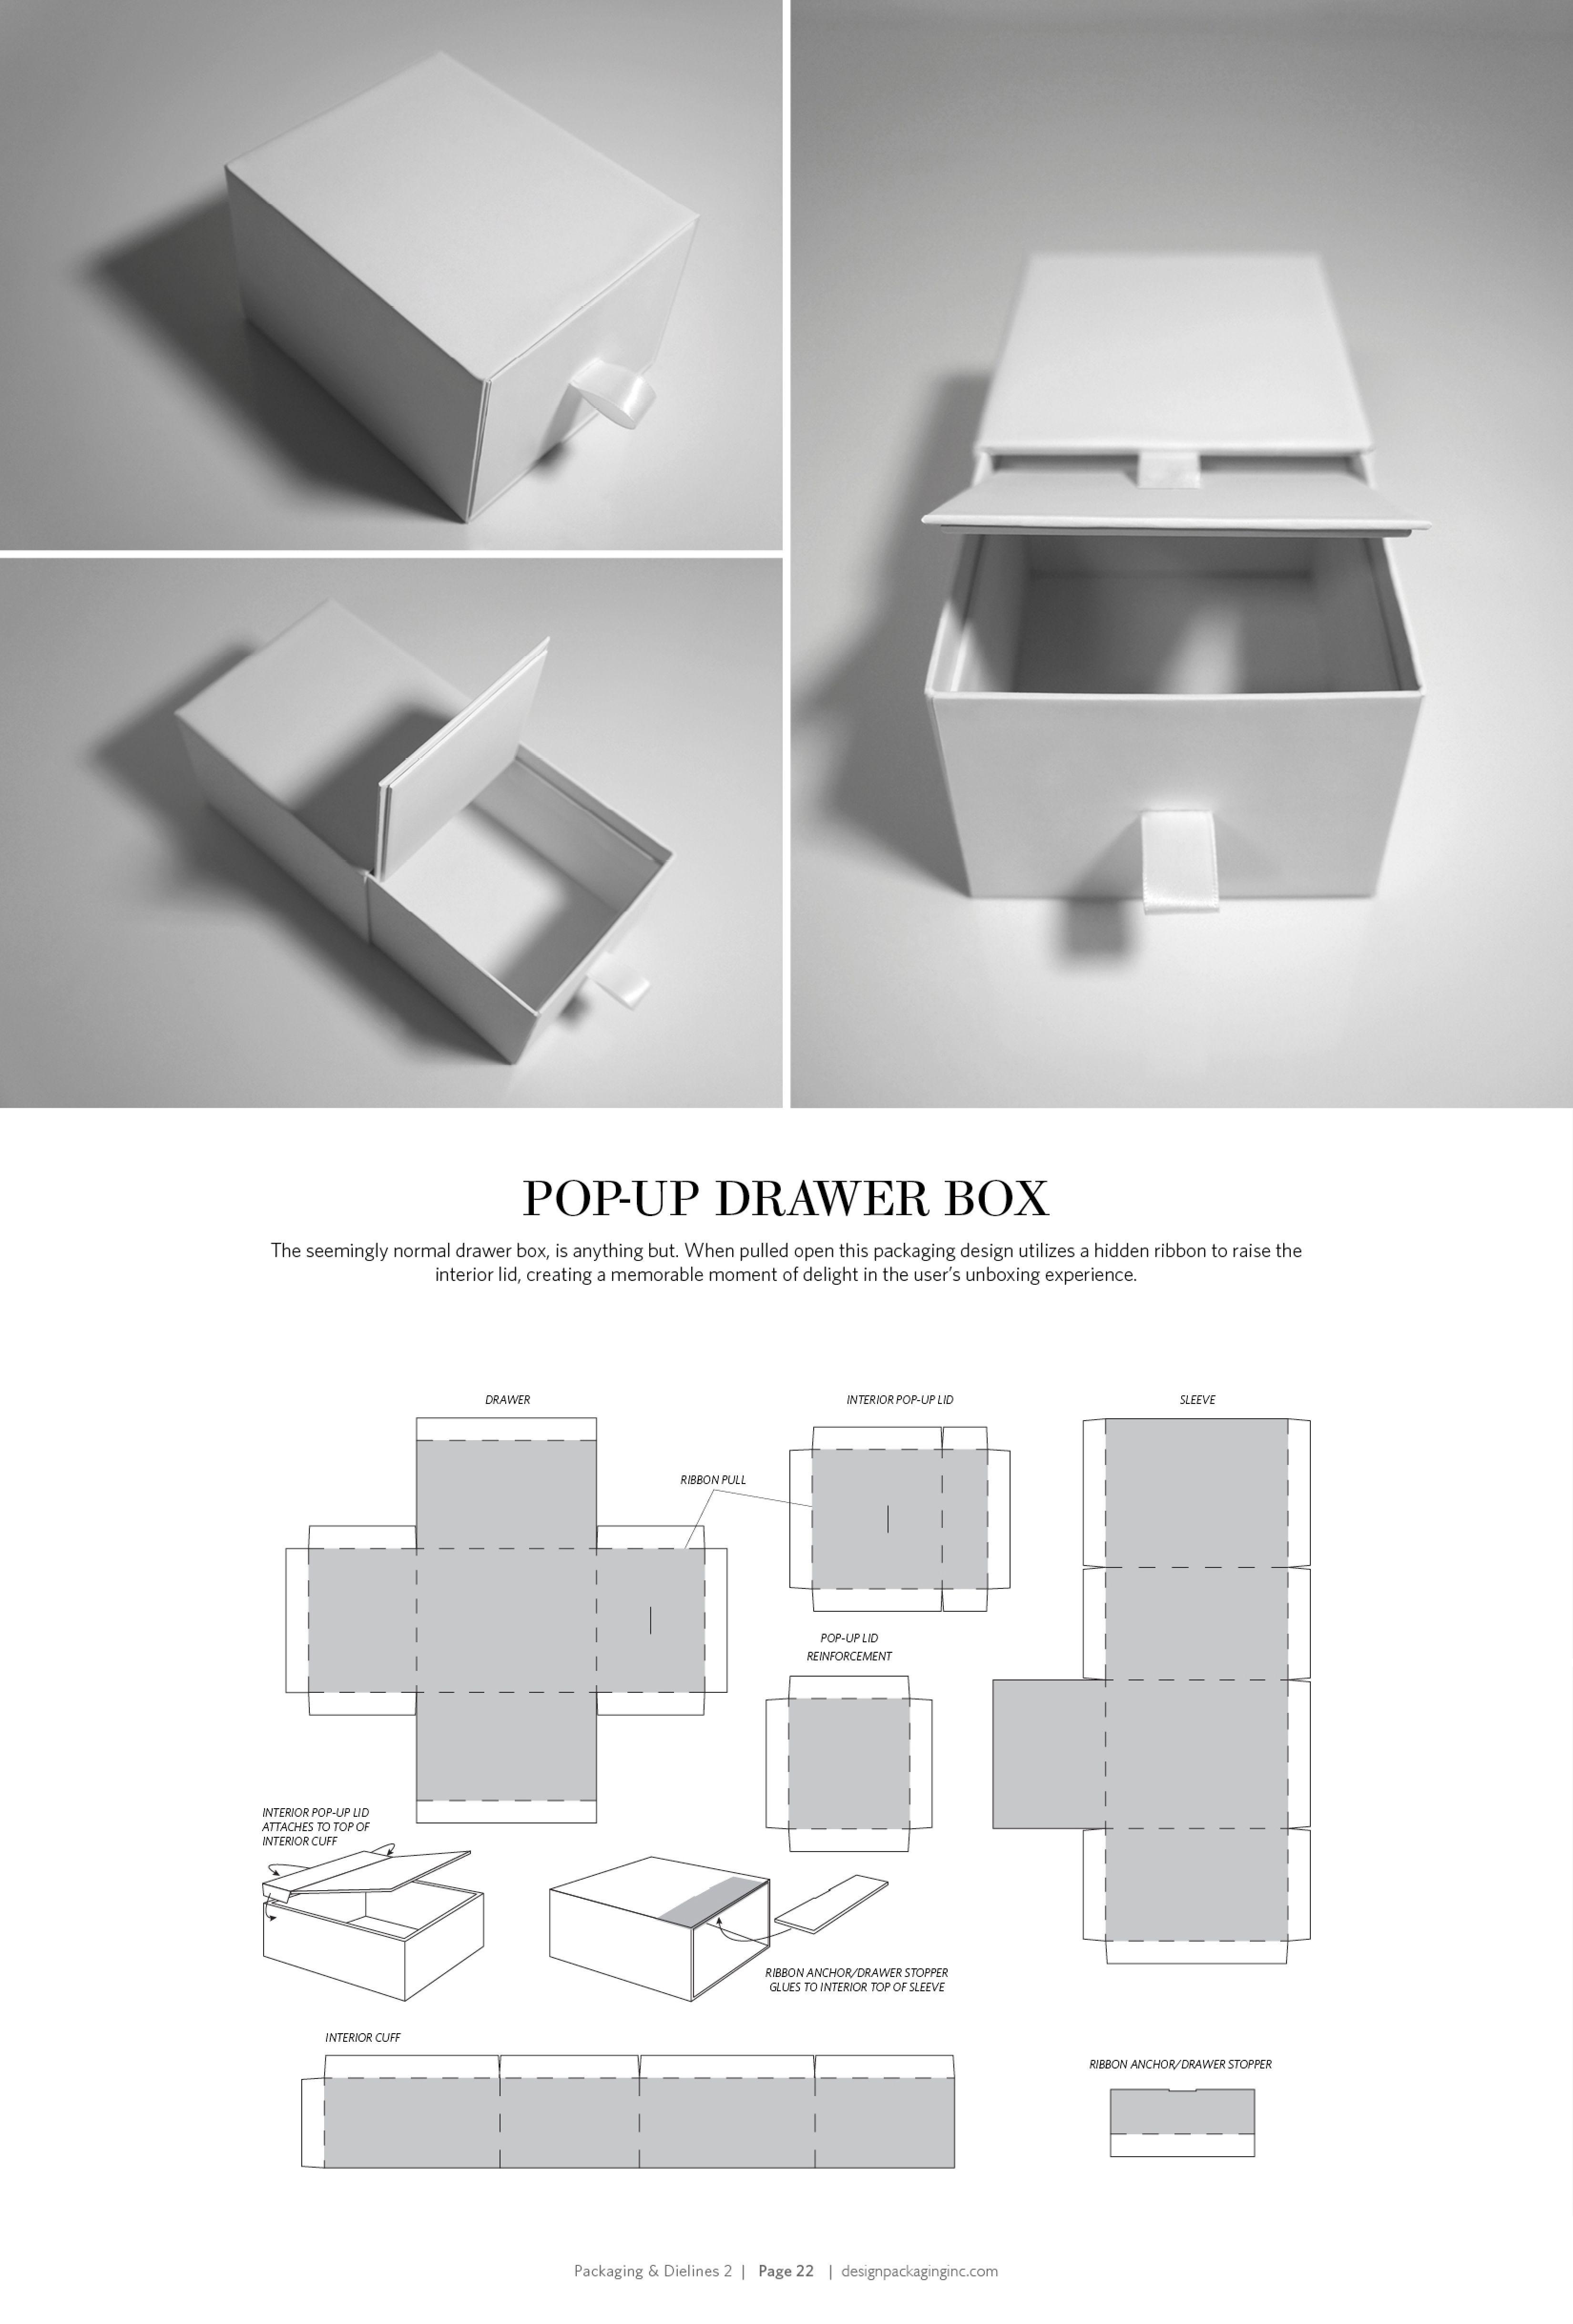 kostenlose sargvorlagen - packaging dielines ii the designer 39 s book of packaging